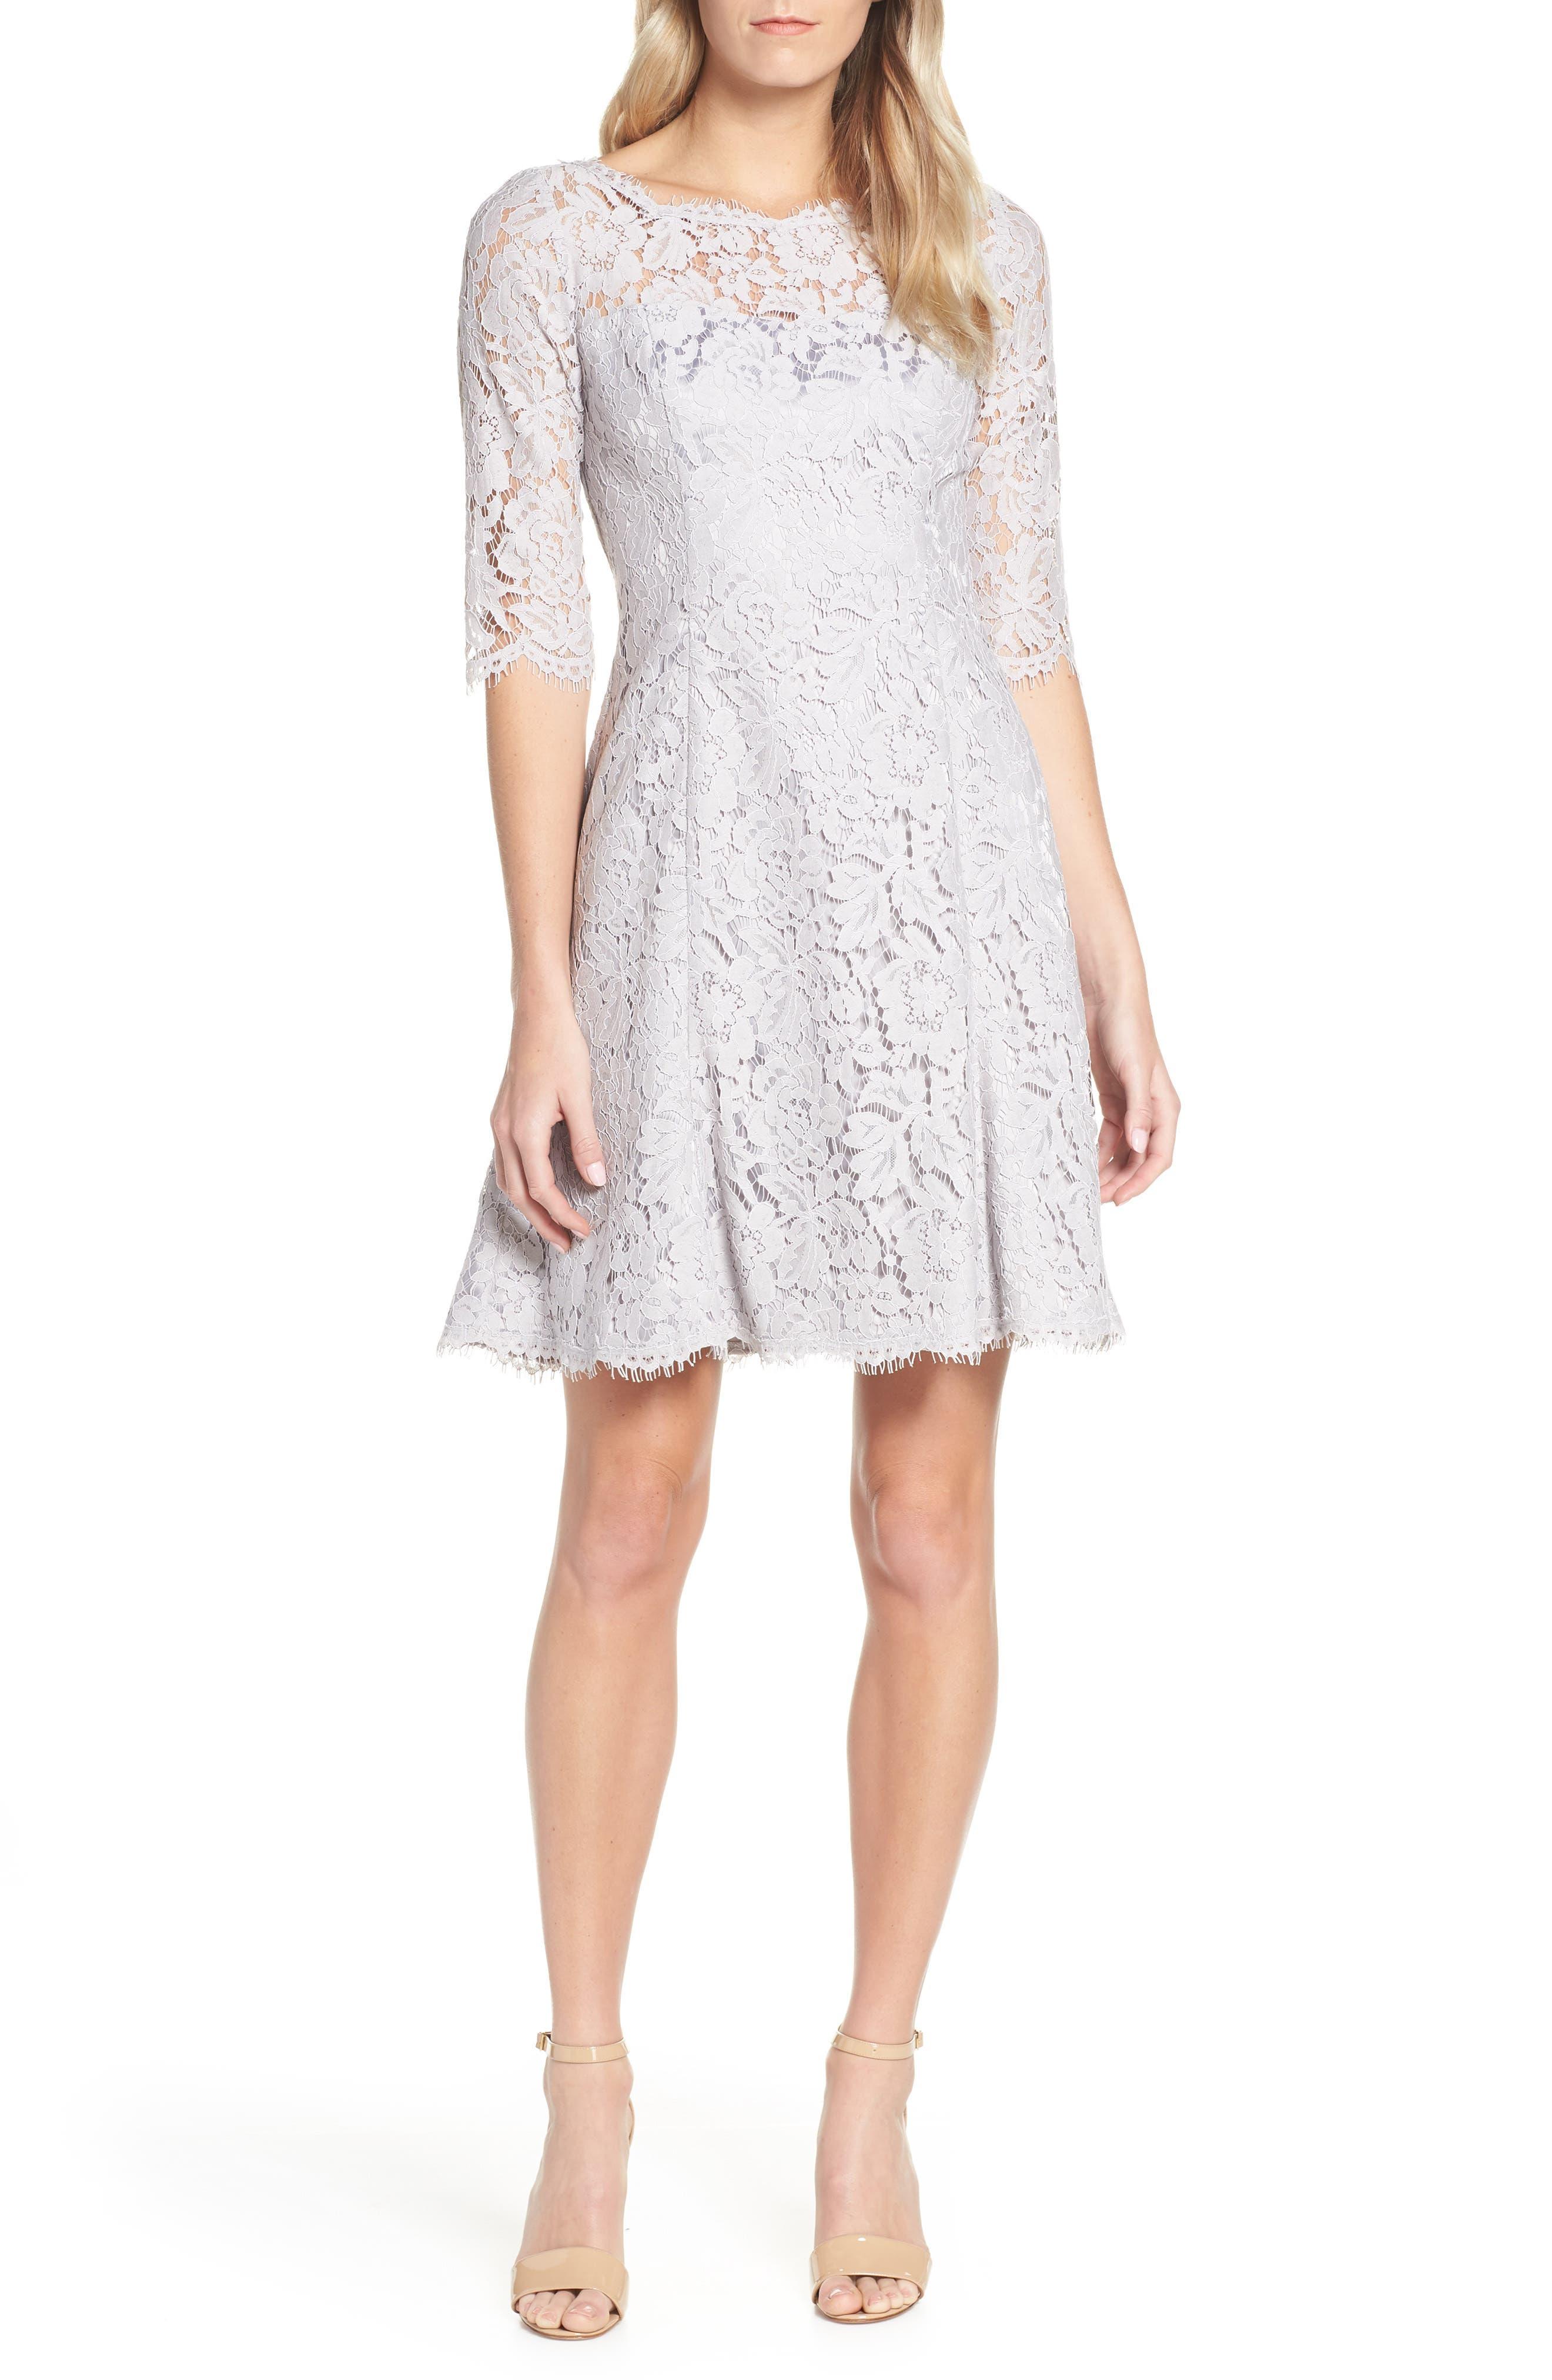 Eliza J Lace Fit & Flare Cocktail Dress, Grey